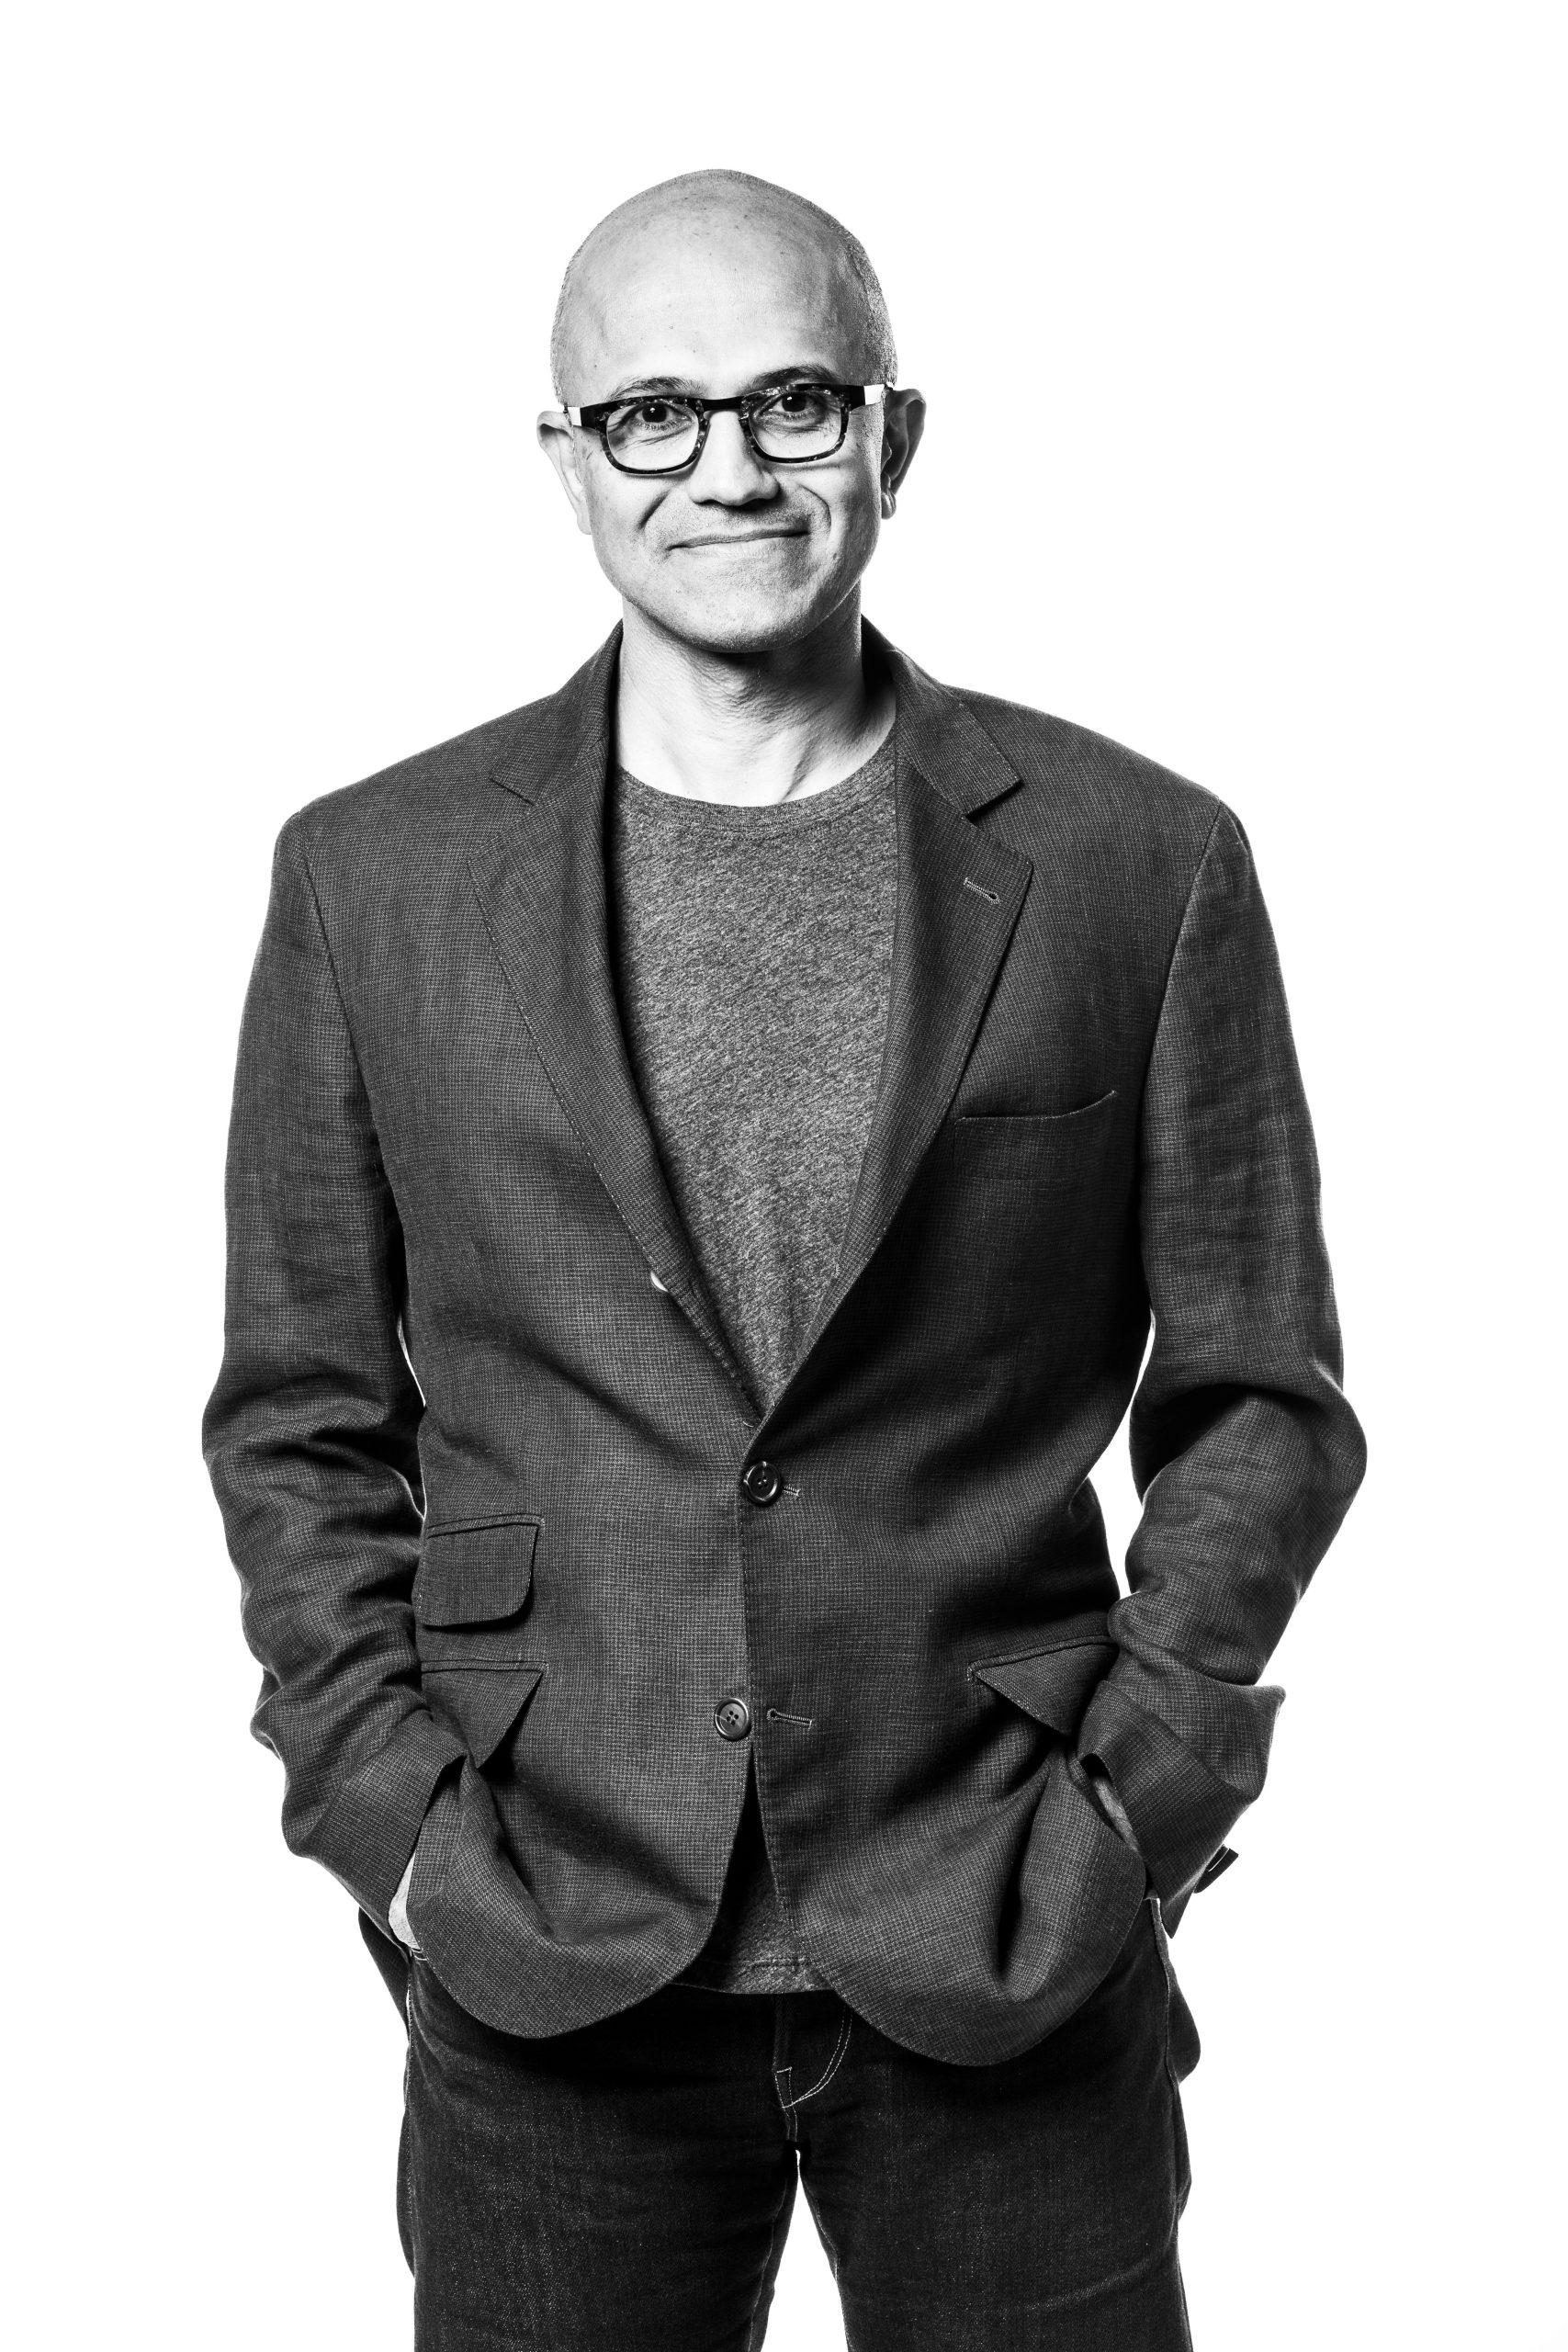 Microsoft CEO Satya Nadella Talks COVID-19 response and Move George Floyd